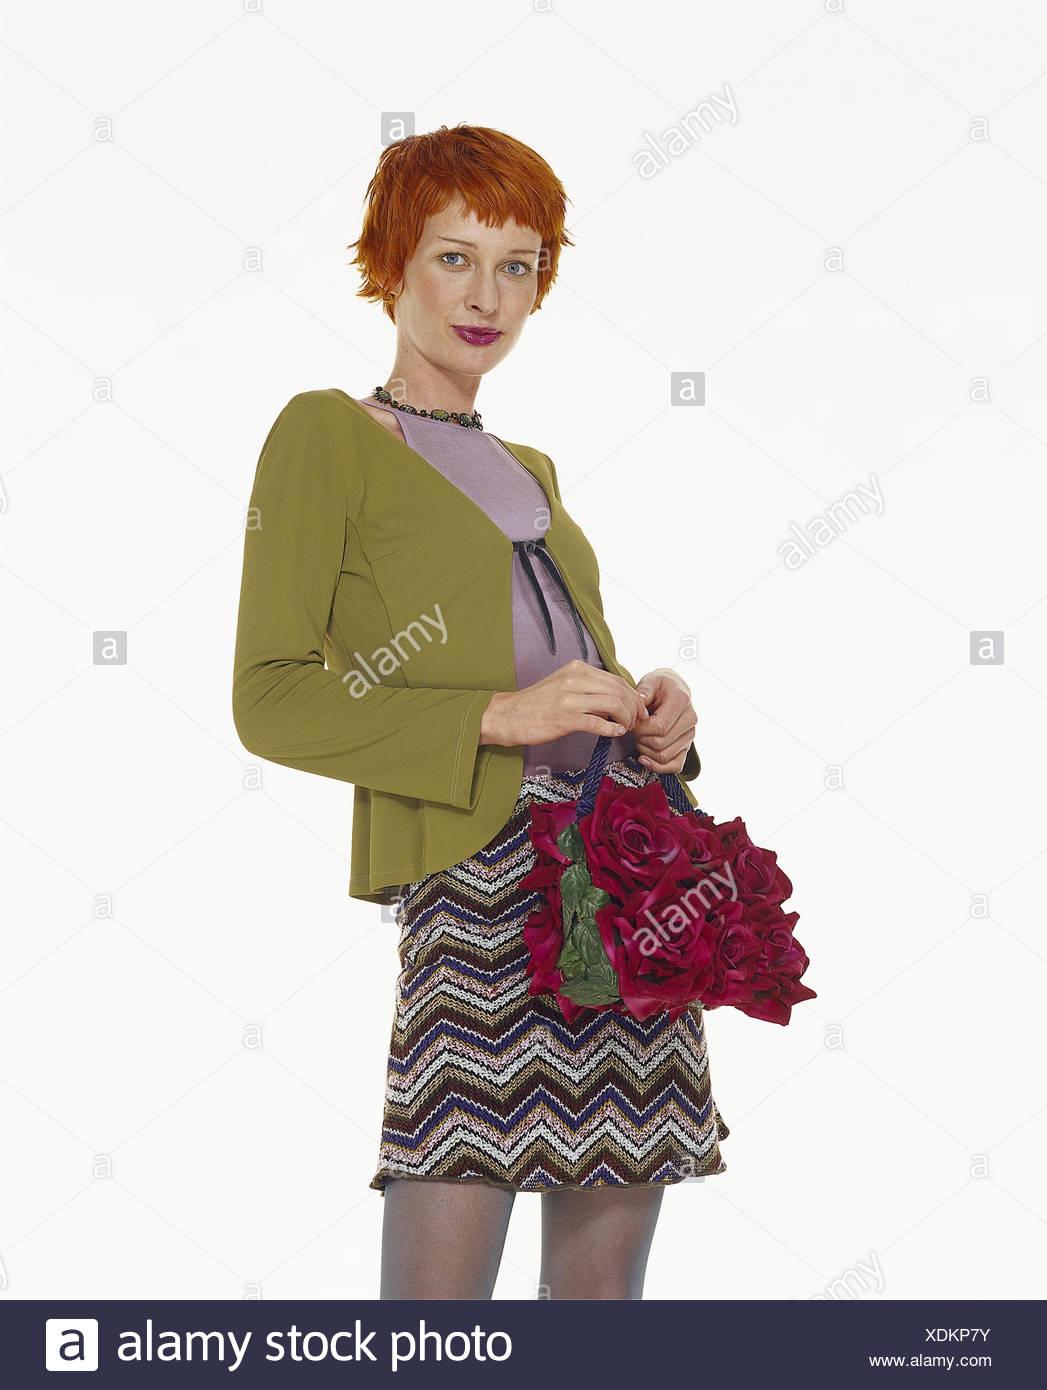 Frau Jung Haare Rot Minirock Handtasche Frauen Rothaarige